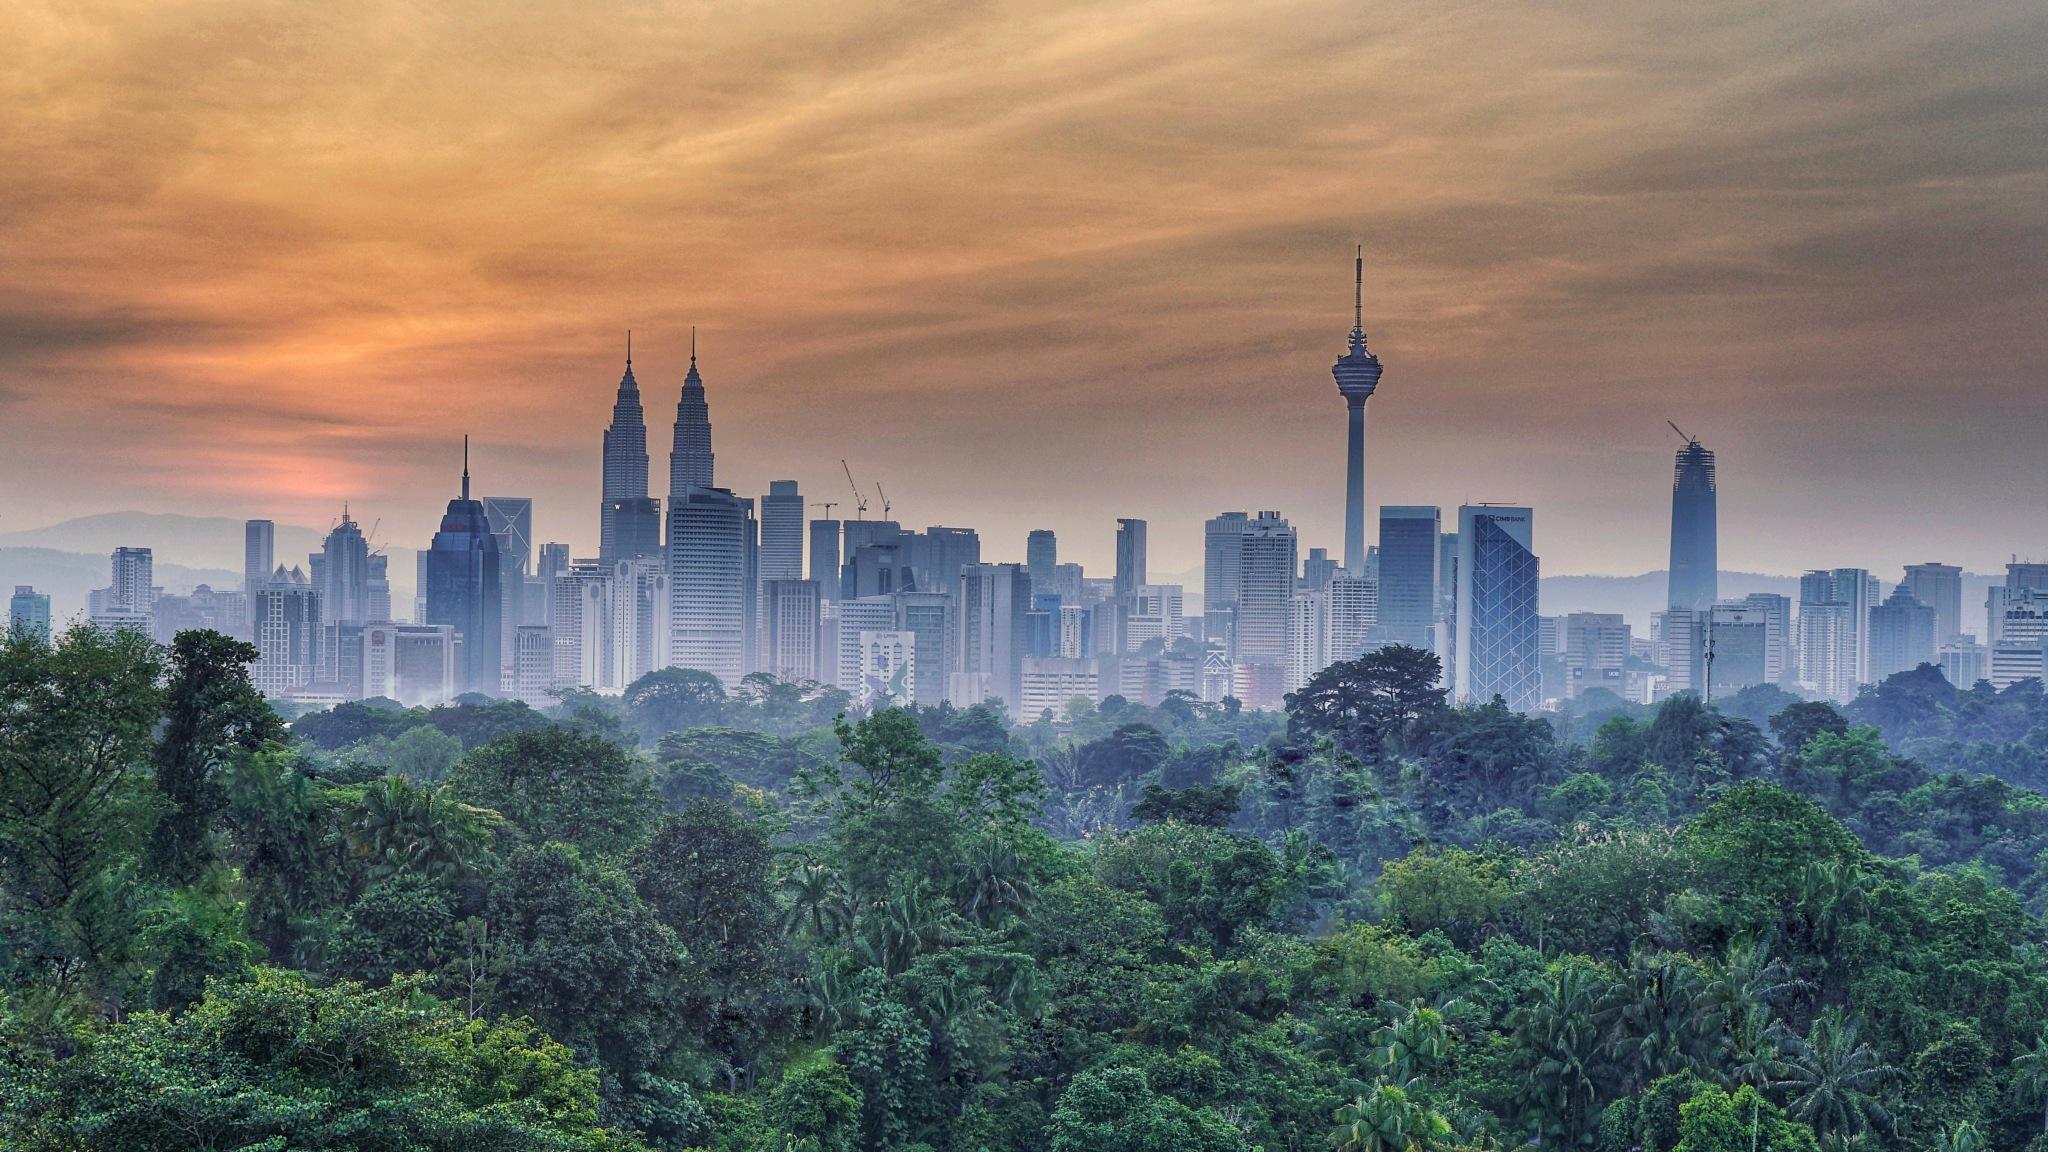 Kuala Lumpur - Morning Shower by Mohd Arrazi Rosdi